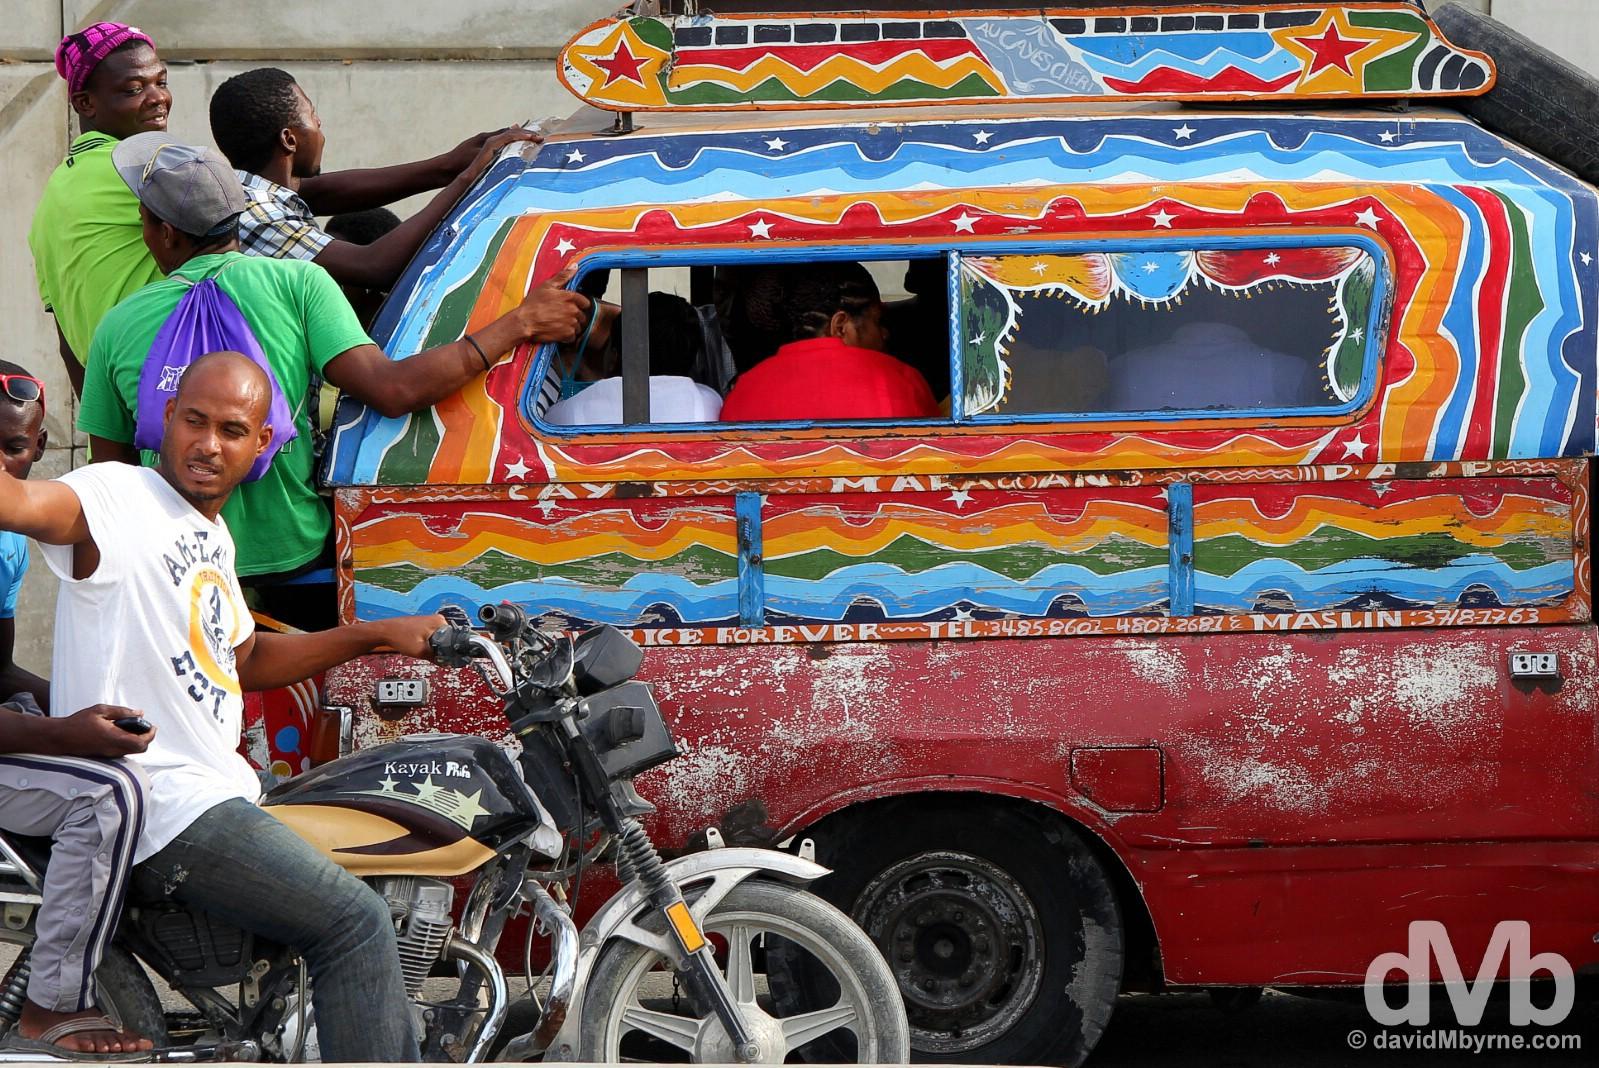 Traffic on Delmas, Port-au-Prince, Haiti. May 17, 2015.